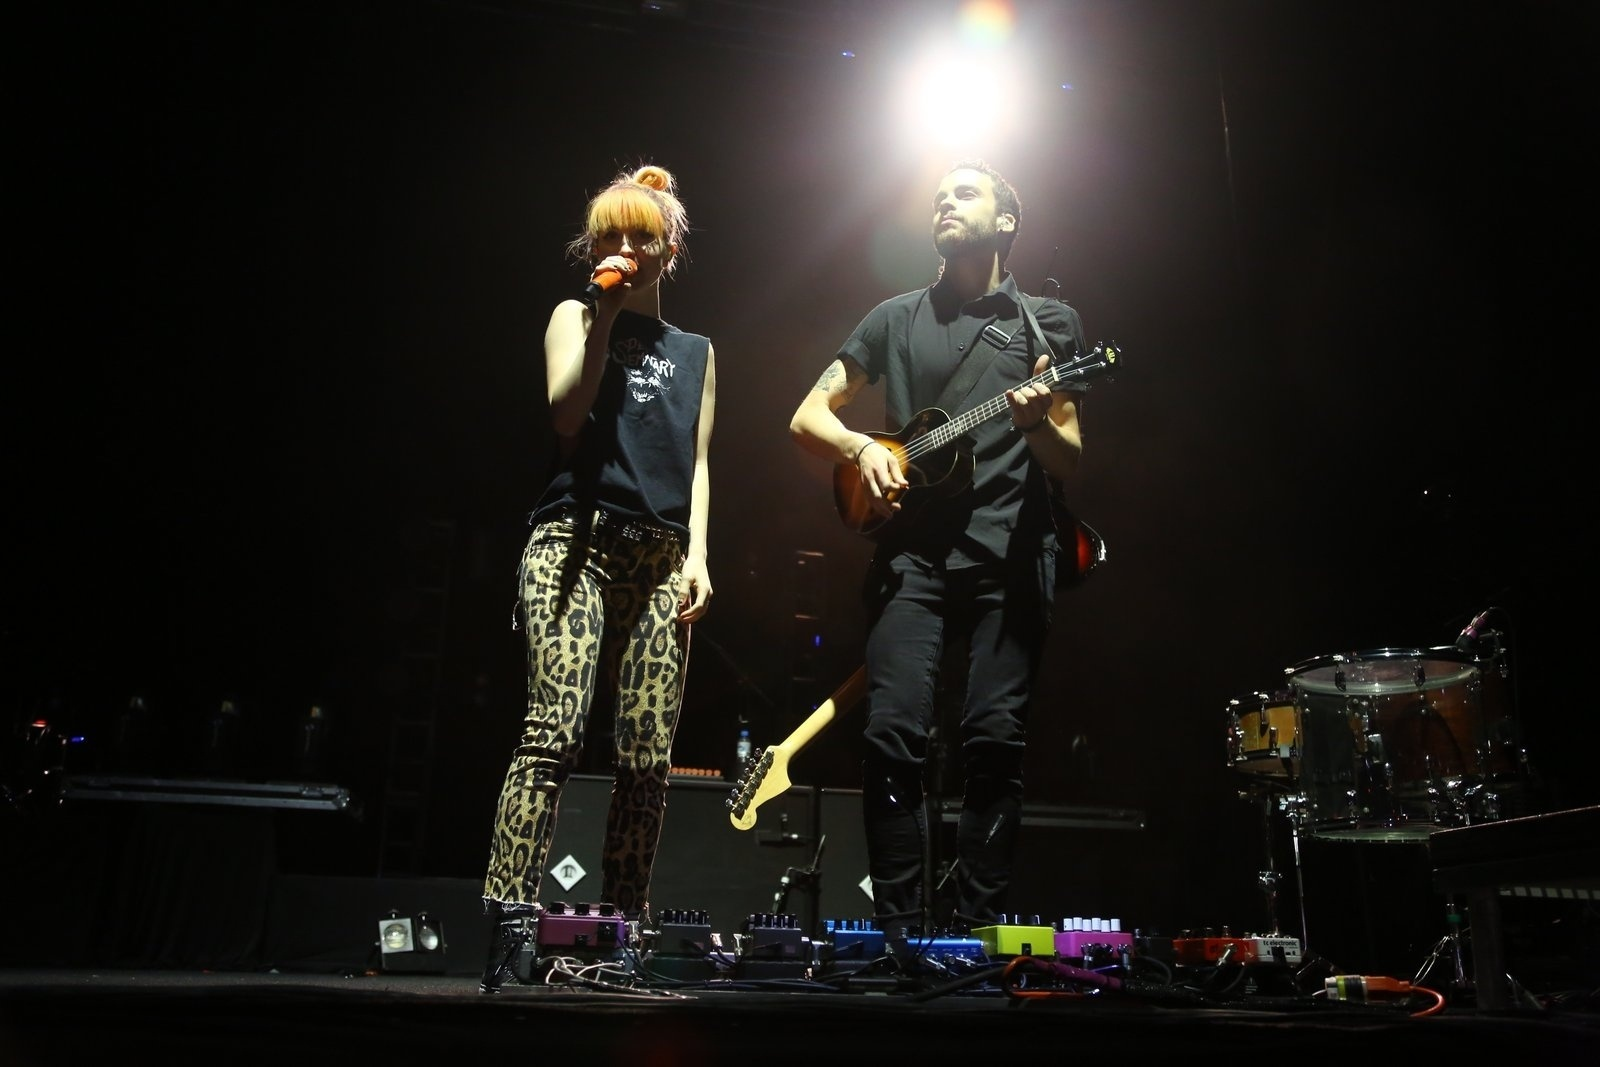 25.jul.2013 - A banda de rock Paramore se apresenta no HSBC Arena, na Barra da Tijuca, Rio de Janeiro